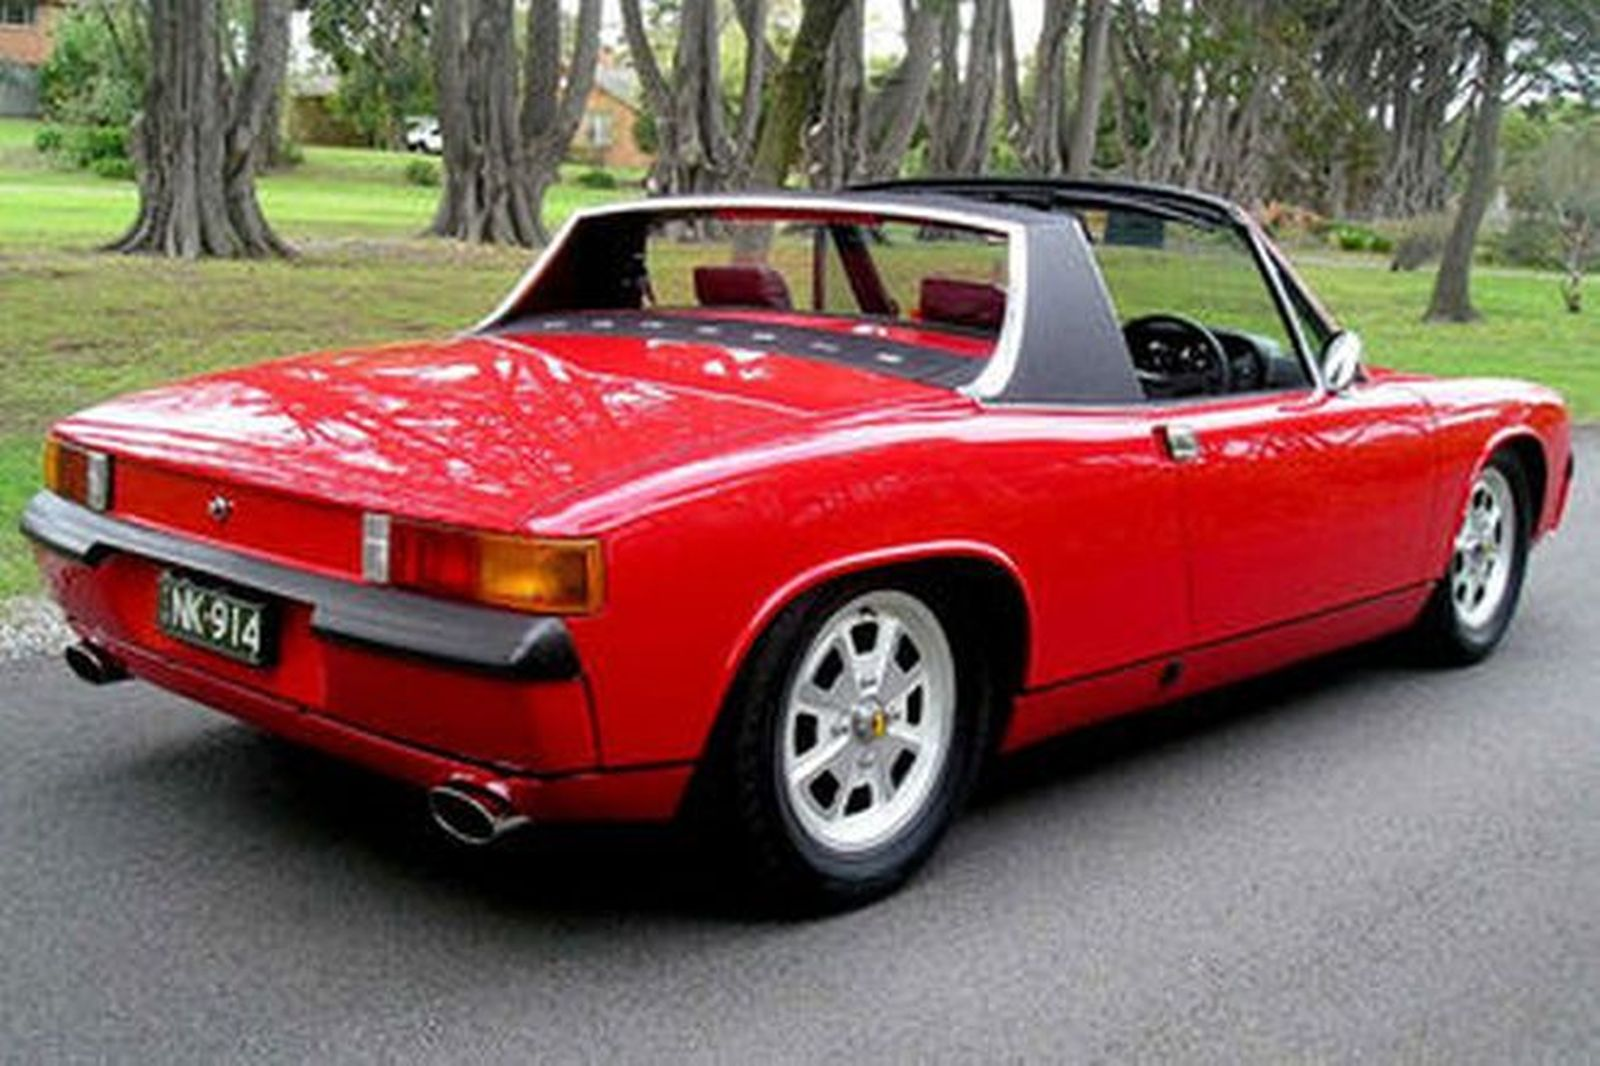 Porsche 914 (6 Cyl.) 'Targa' Coupe (RHD)